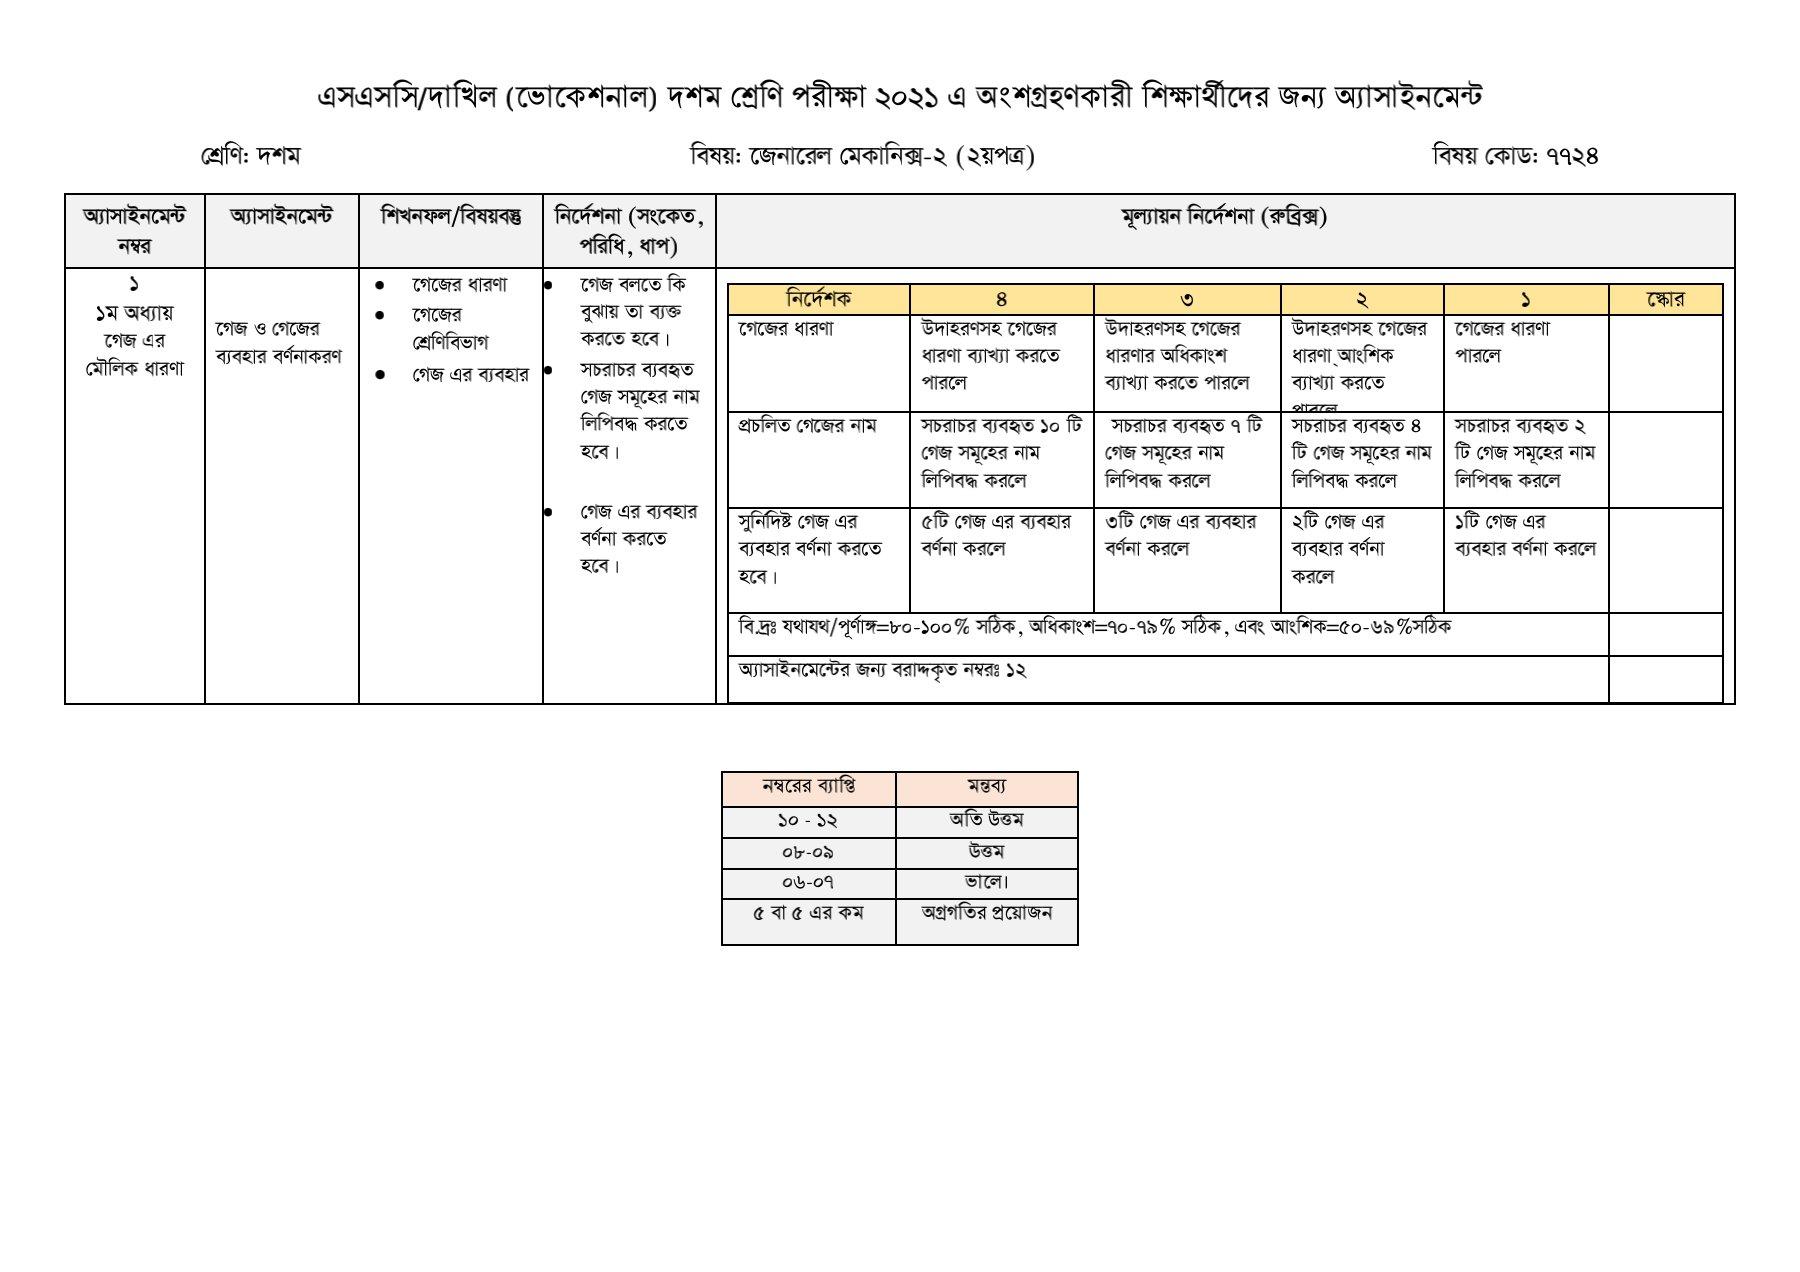 SSC/ Dakhil (Vocational) General Mechanics Assignment Answer 2021 PDF Download